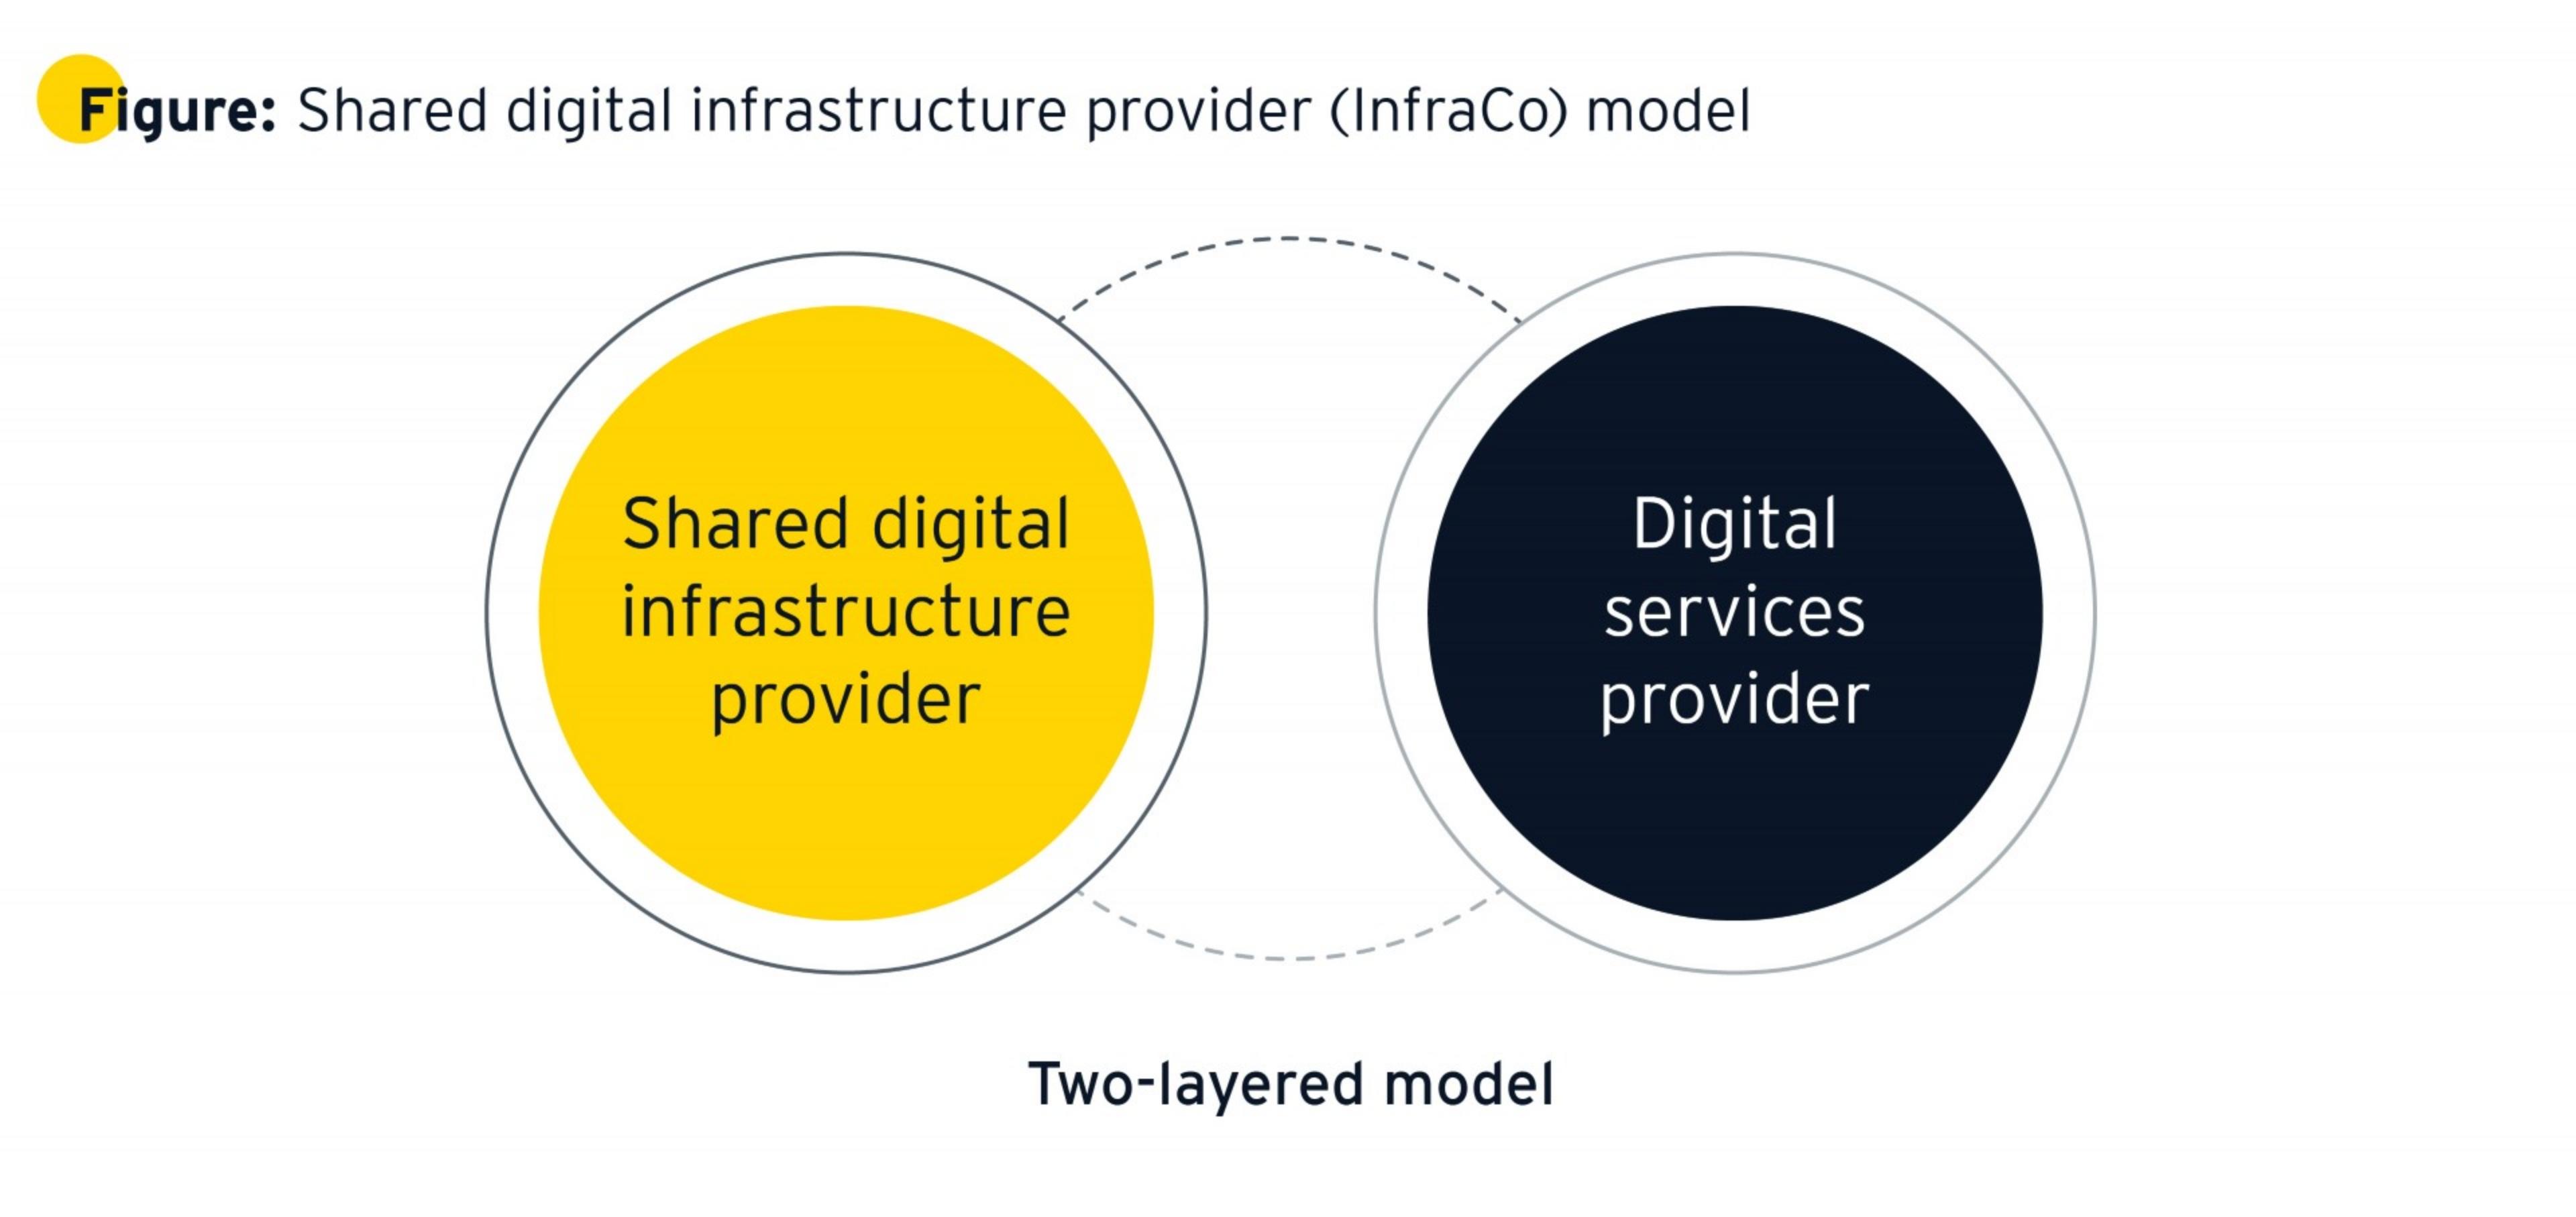 Shared digital infrastructure provider (infraCO) model